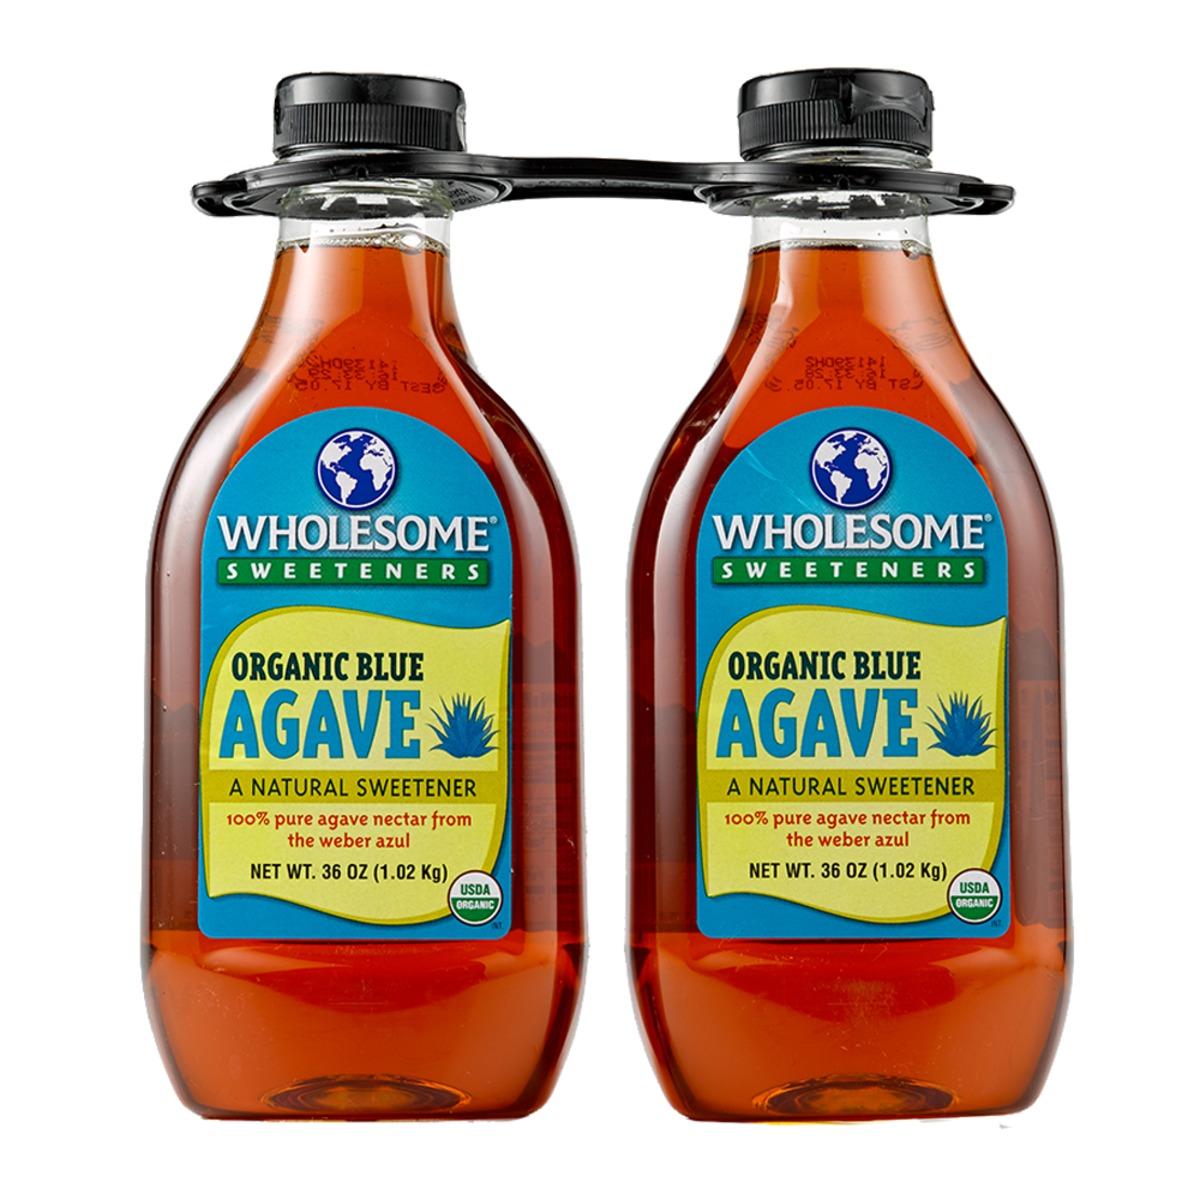 Wholesome Sweeteners 有機龍舌蘭糖漿 1.02公斤 X 2入/組